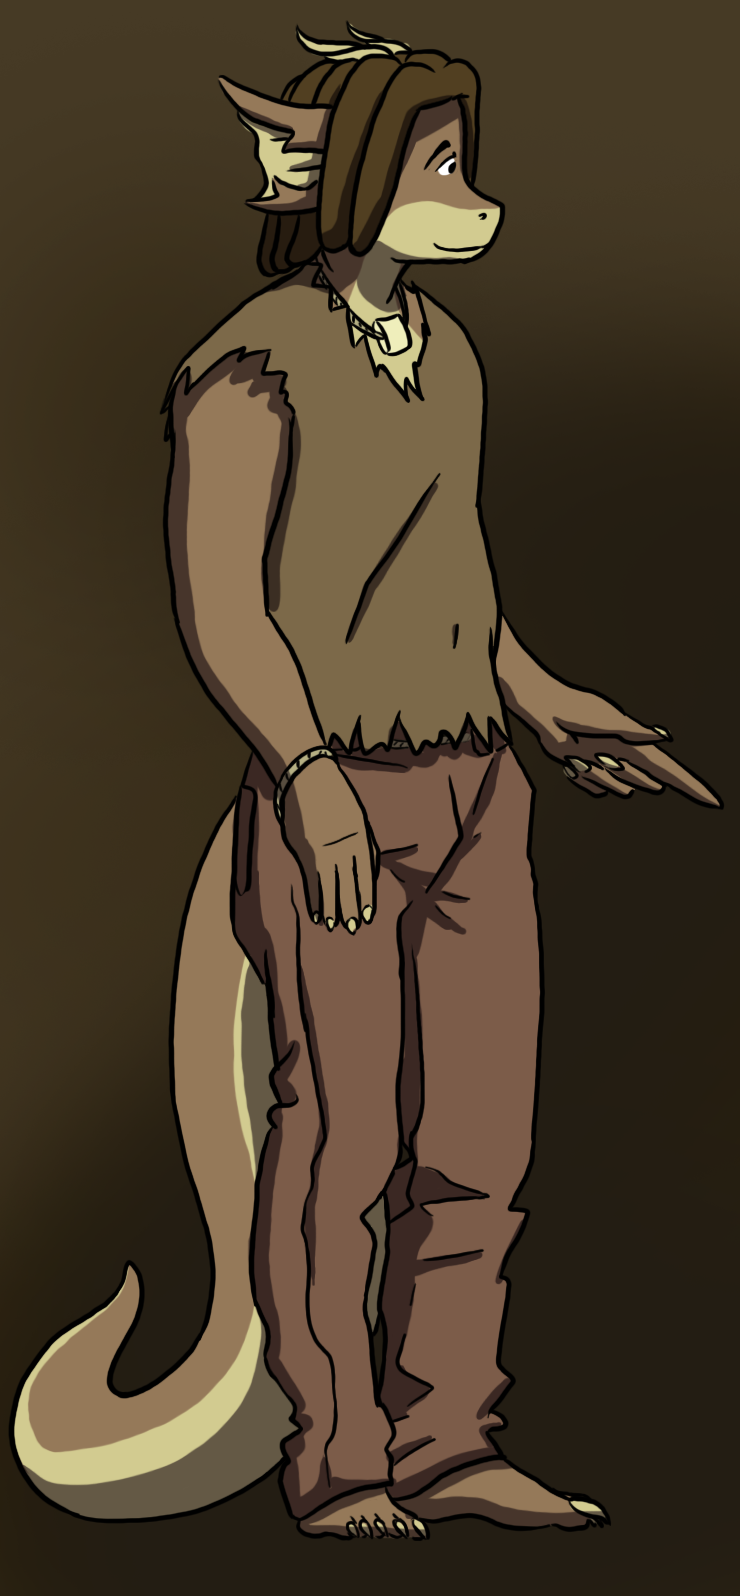 Skip pointing at nothing by Morgoth883